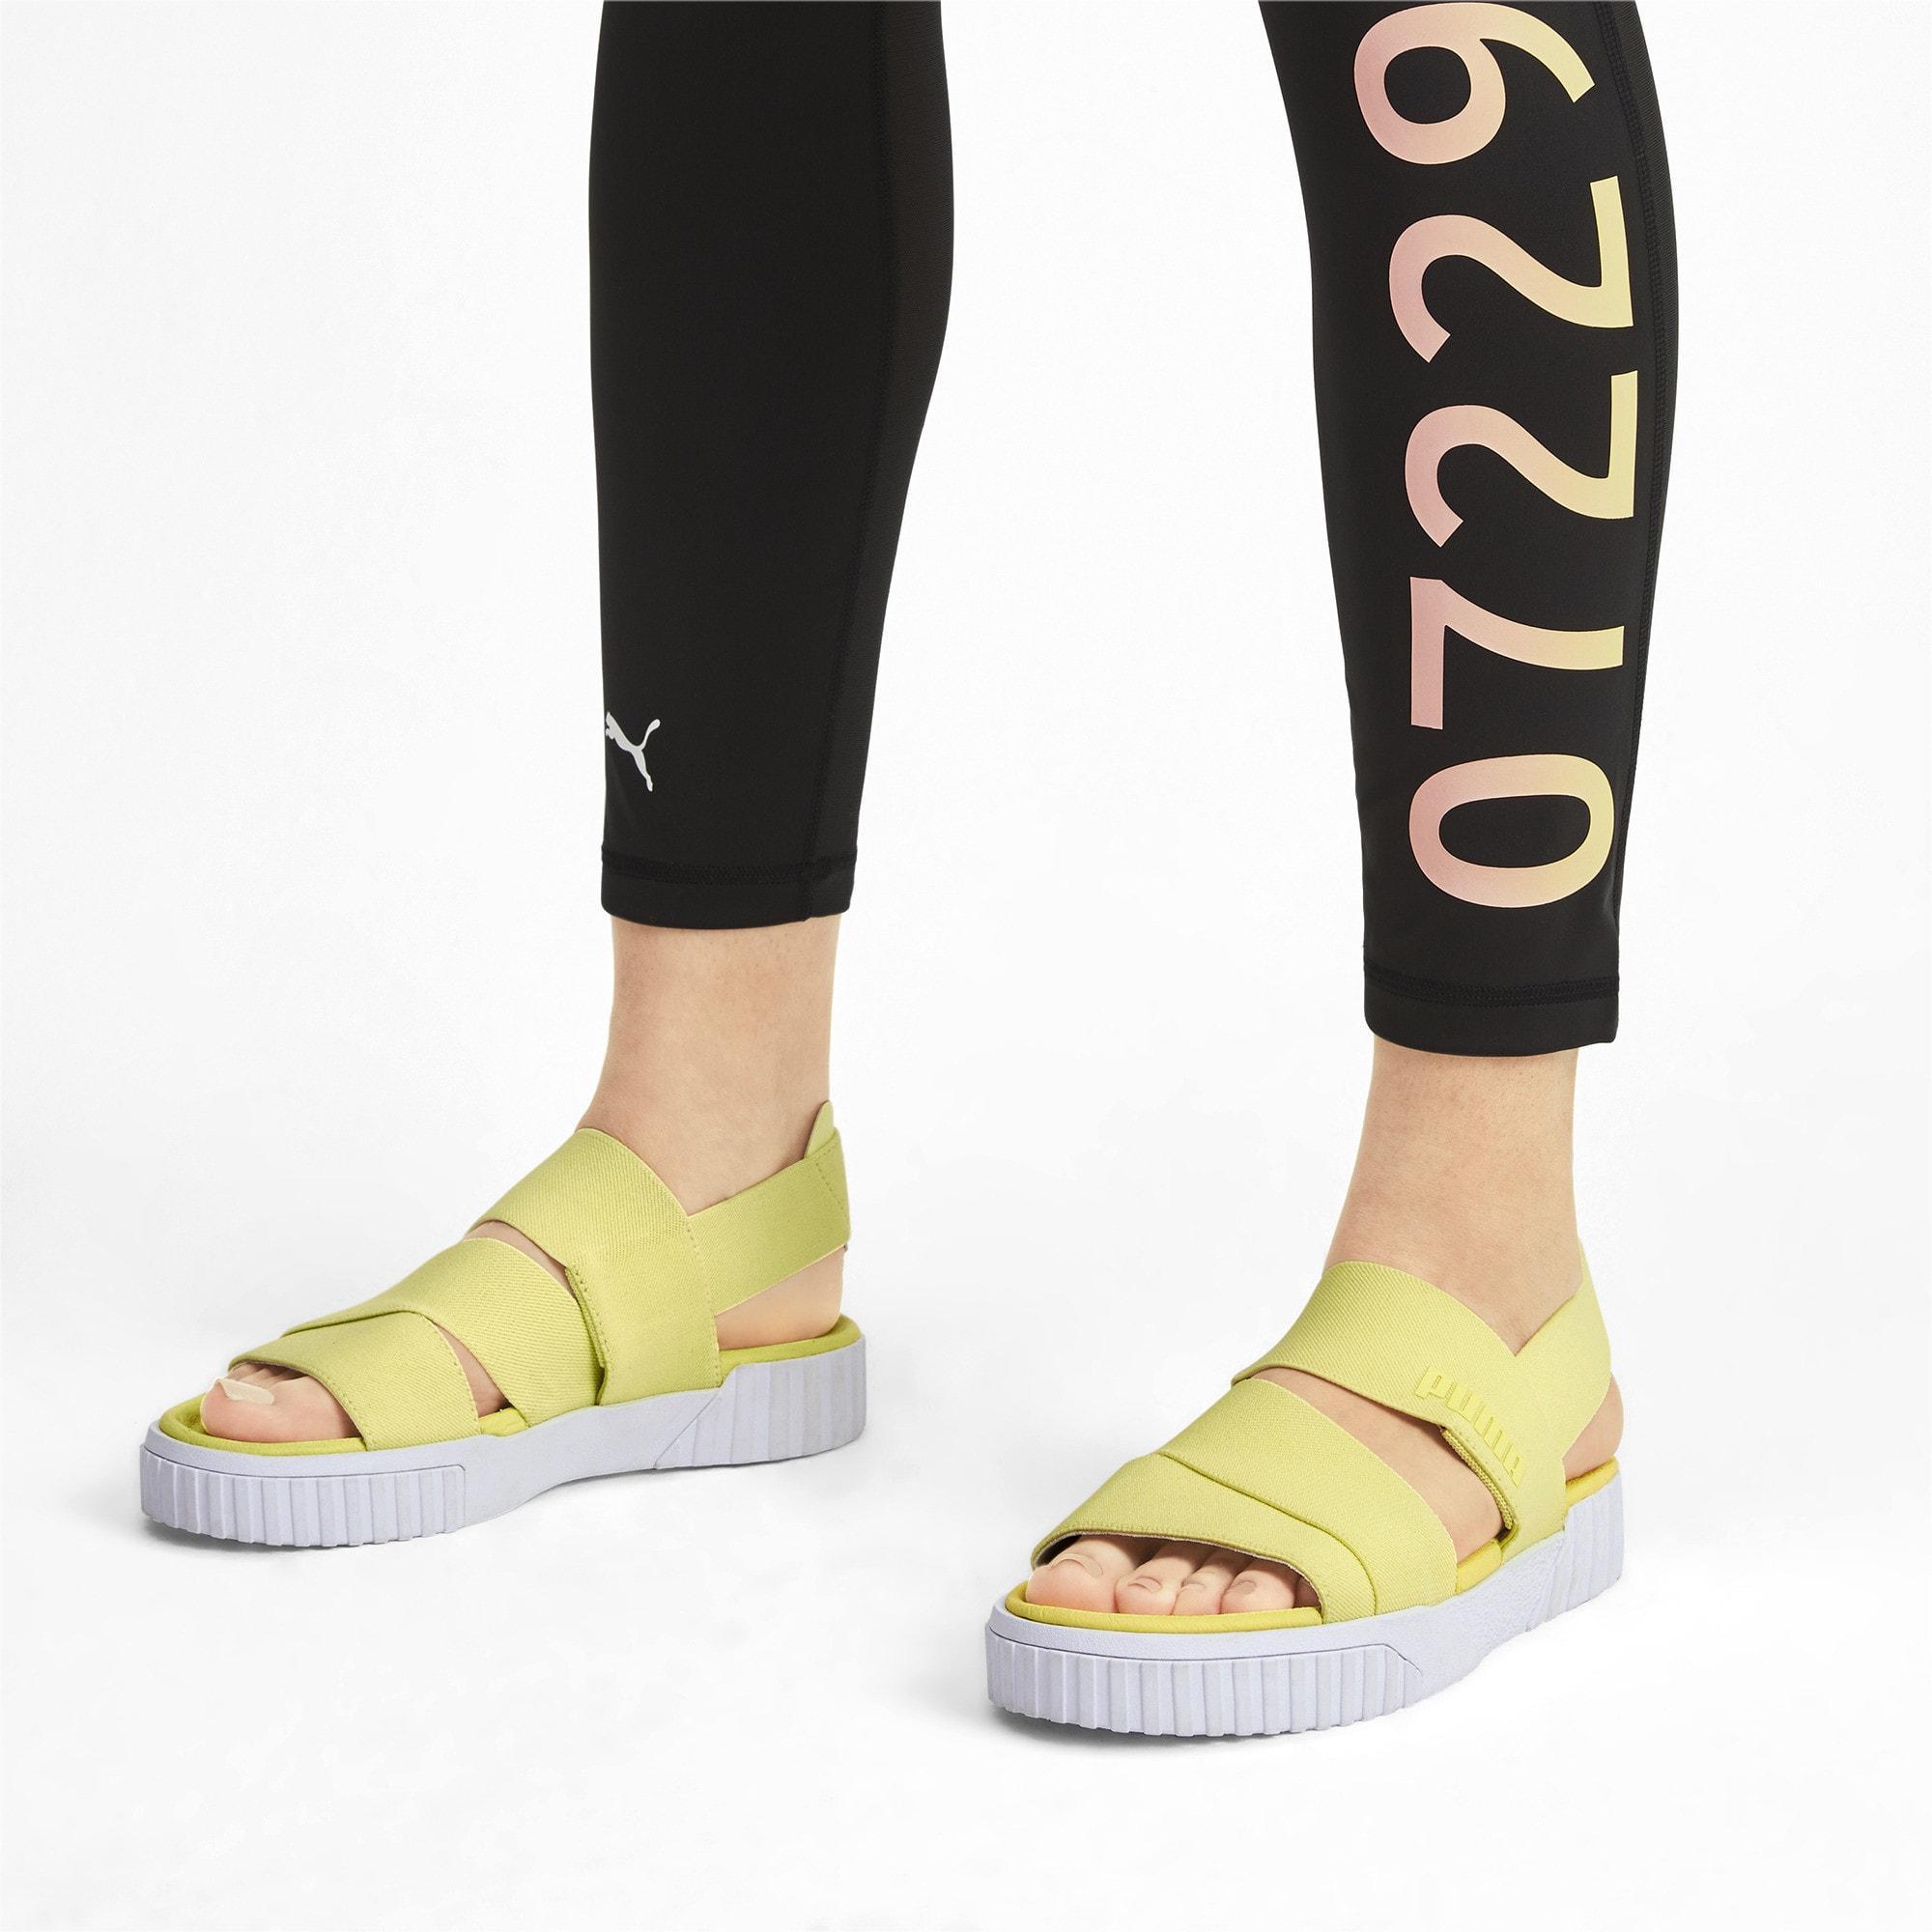 PUMA Rubber Sg X Cali Sandal in Yellow